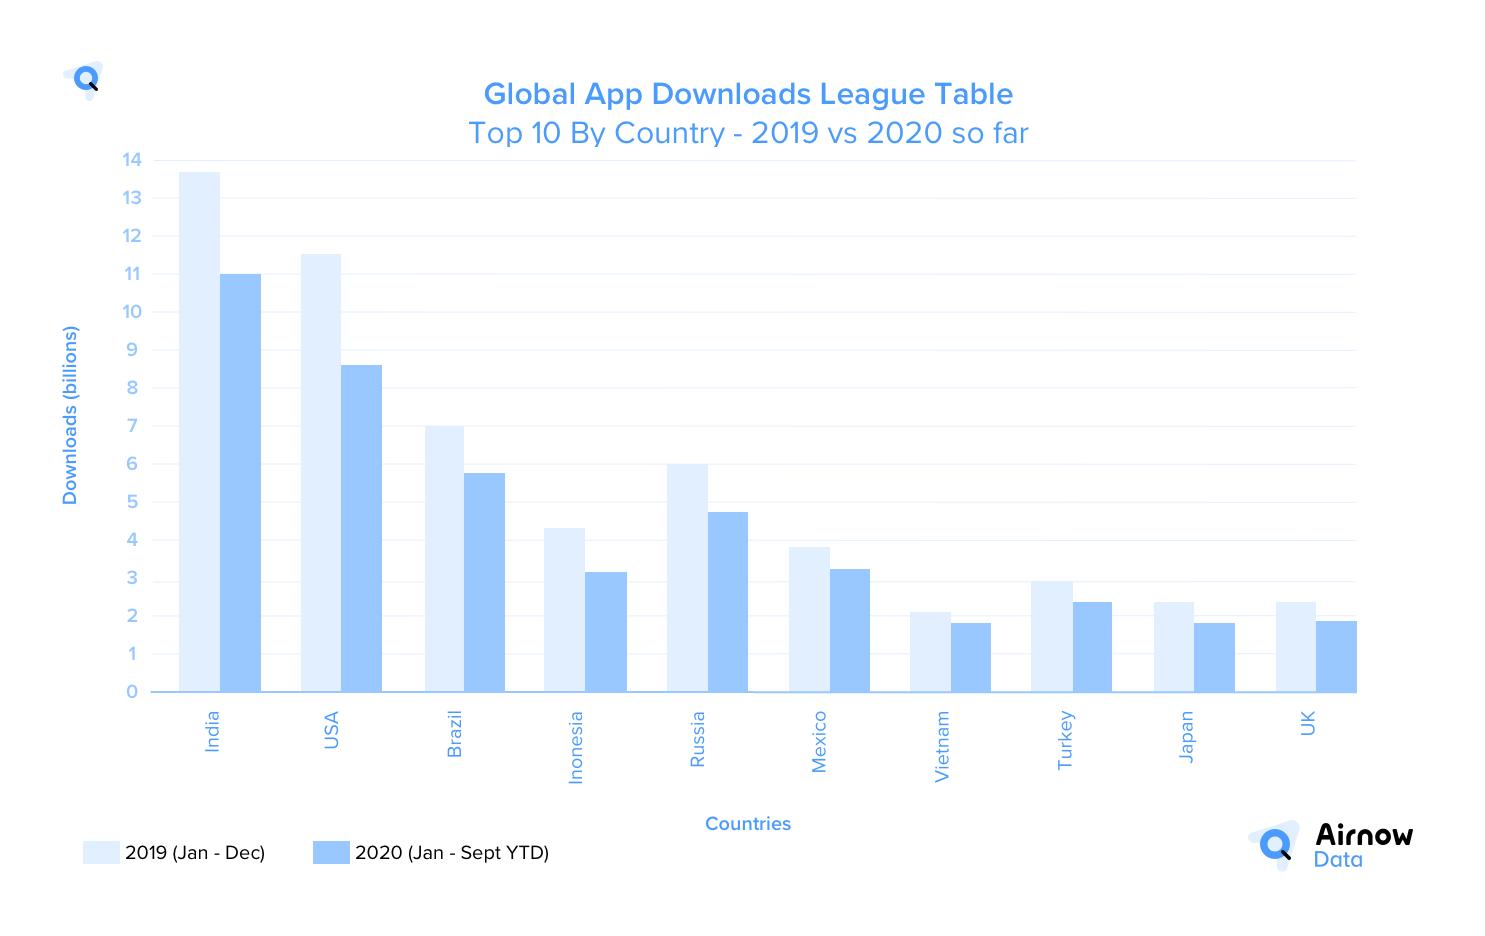 Global App Downloads League Table